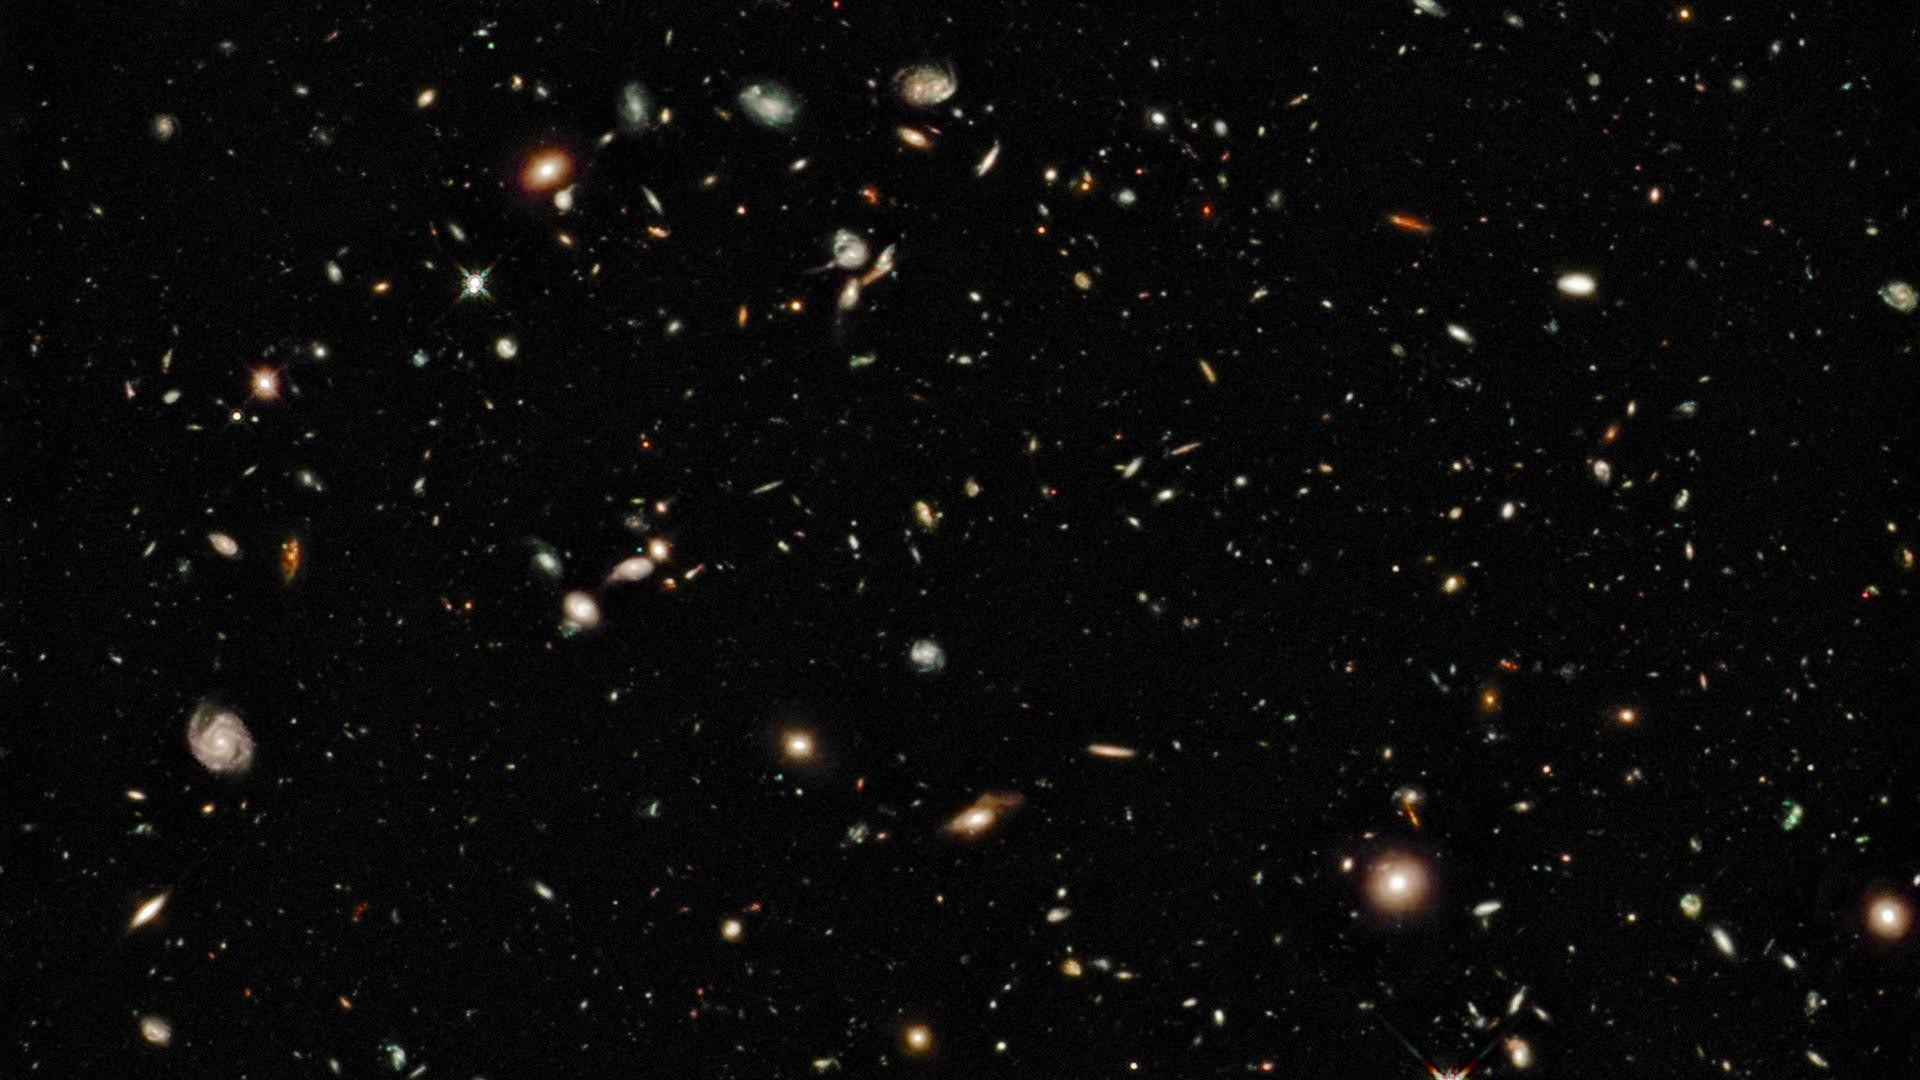 wallpaper.wiki-Free-Hubble-Image-1920×1080-Download-PIC-